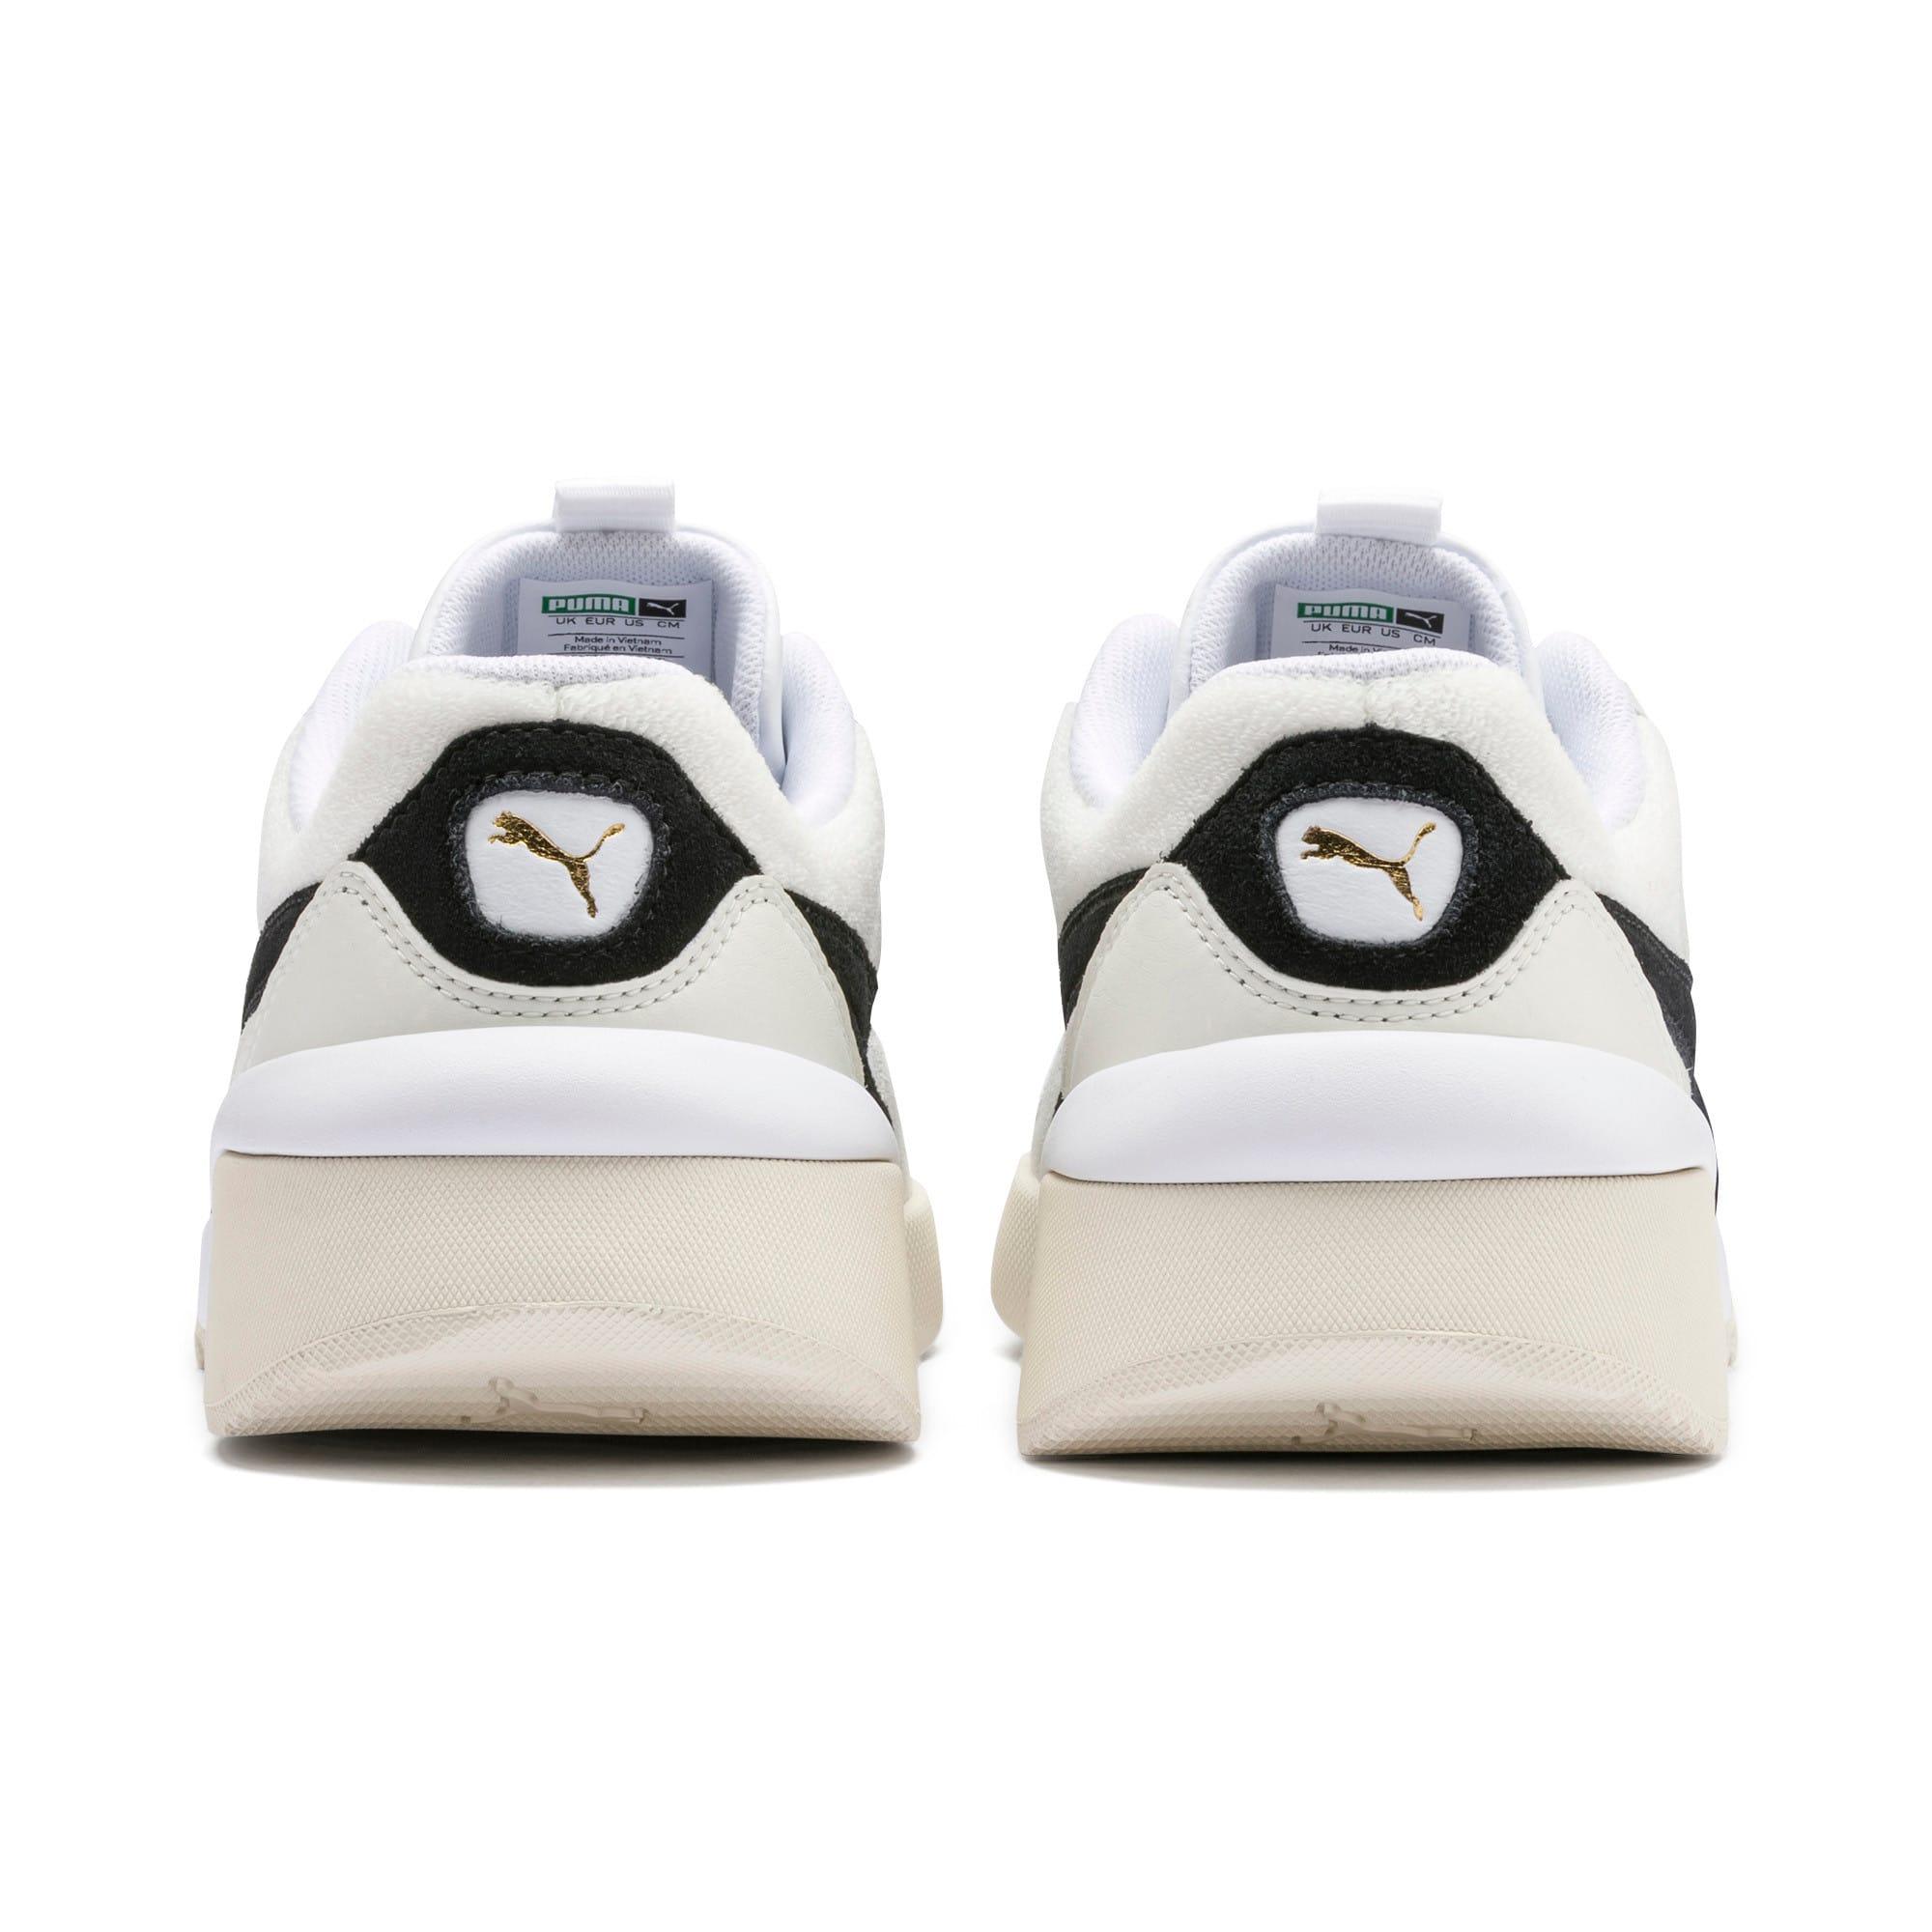 Thumbnail 4 of Aeon Heritage Women's Sneakers, Puma White-Puma Black, medium